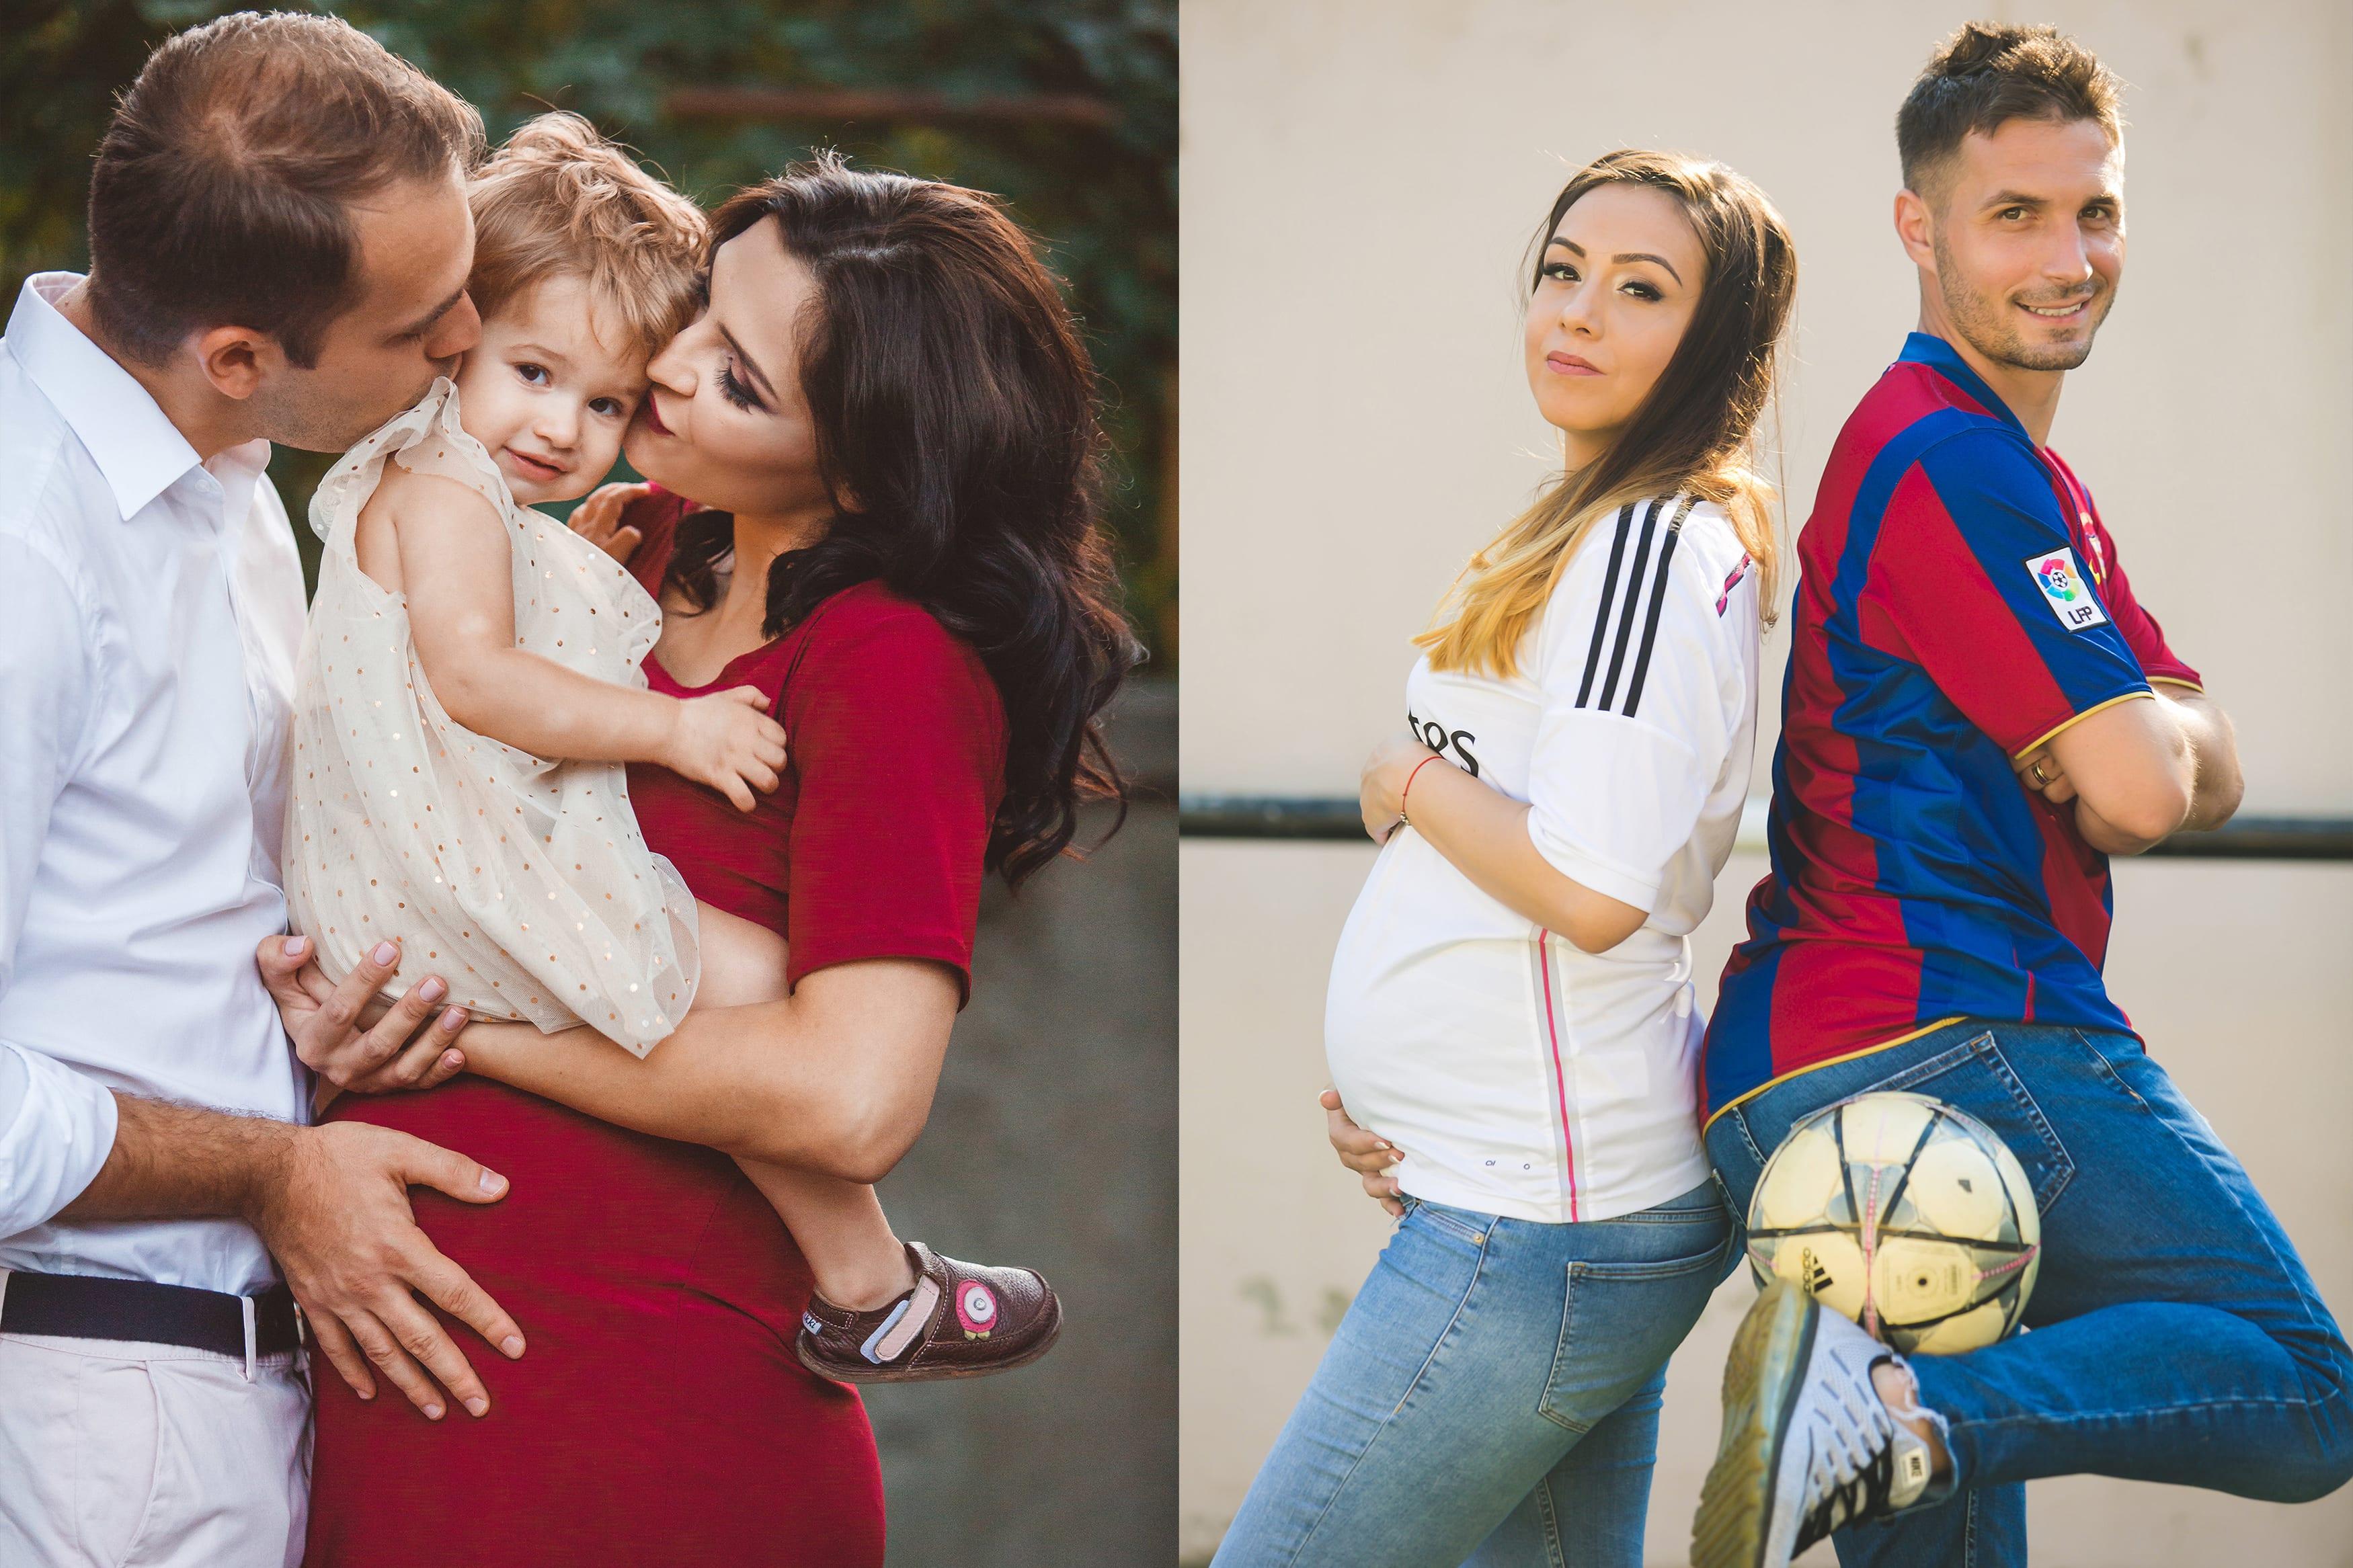 Junges Paar mit schwangerer Frau